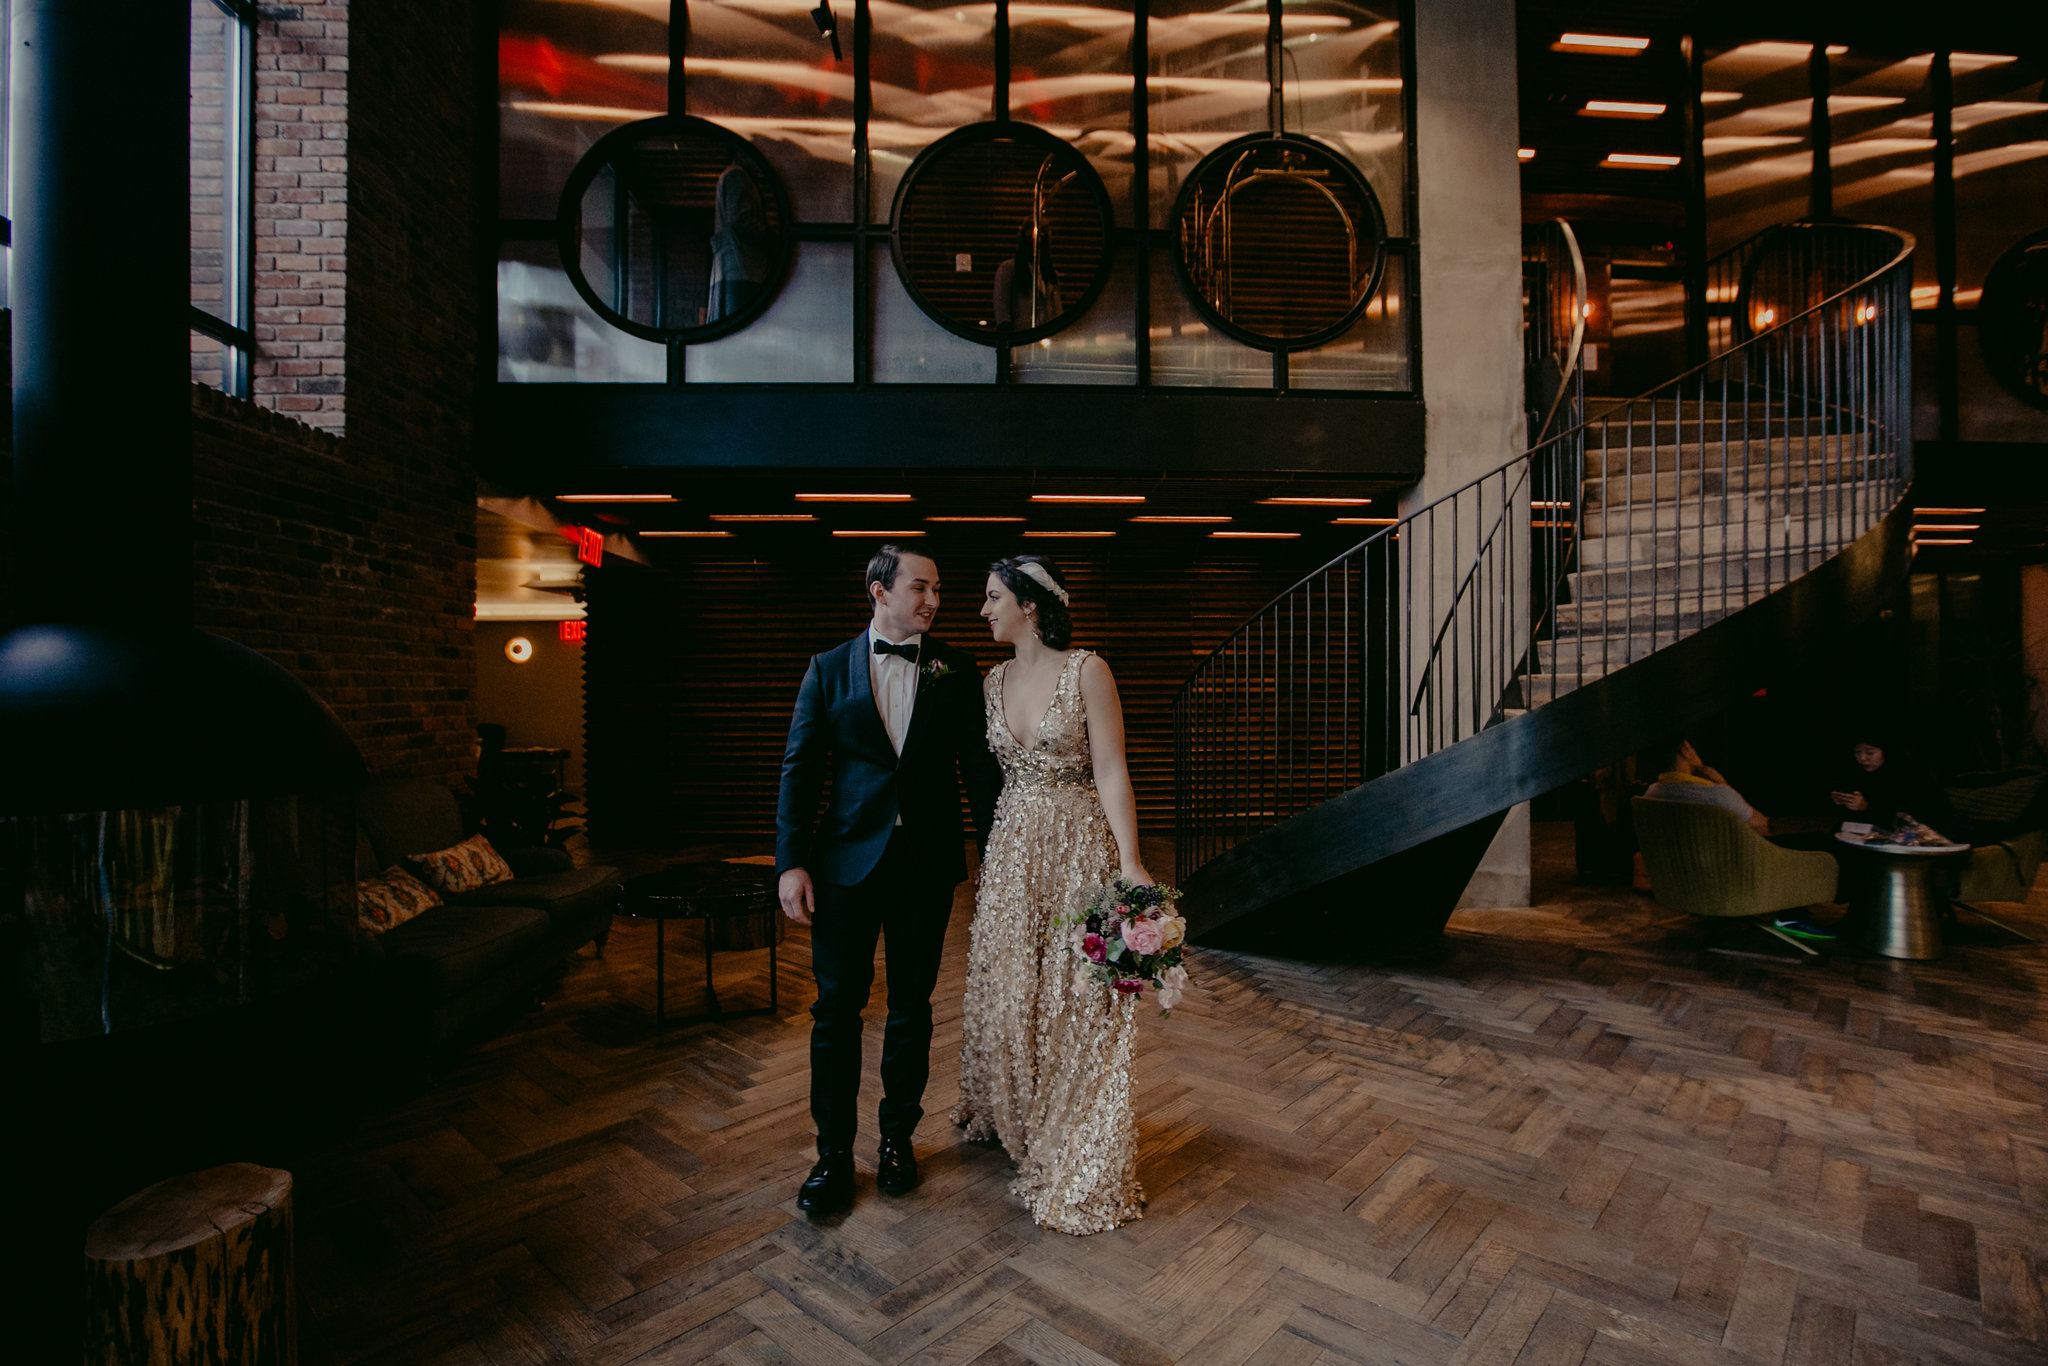 Williamsburg_Hotel_Wedding_Photographer_Chellise_Michael_Photography-187.jpg